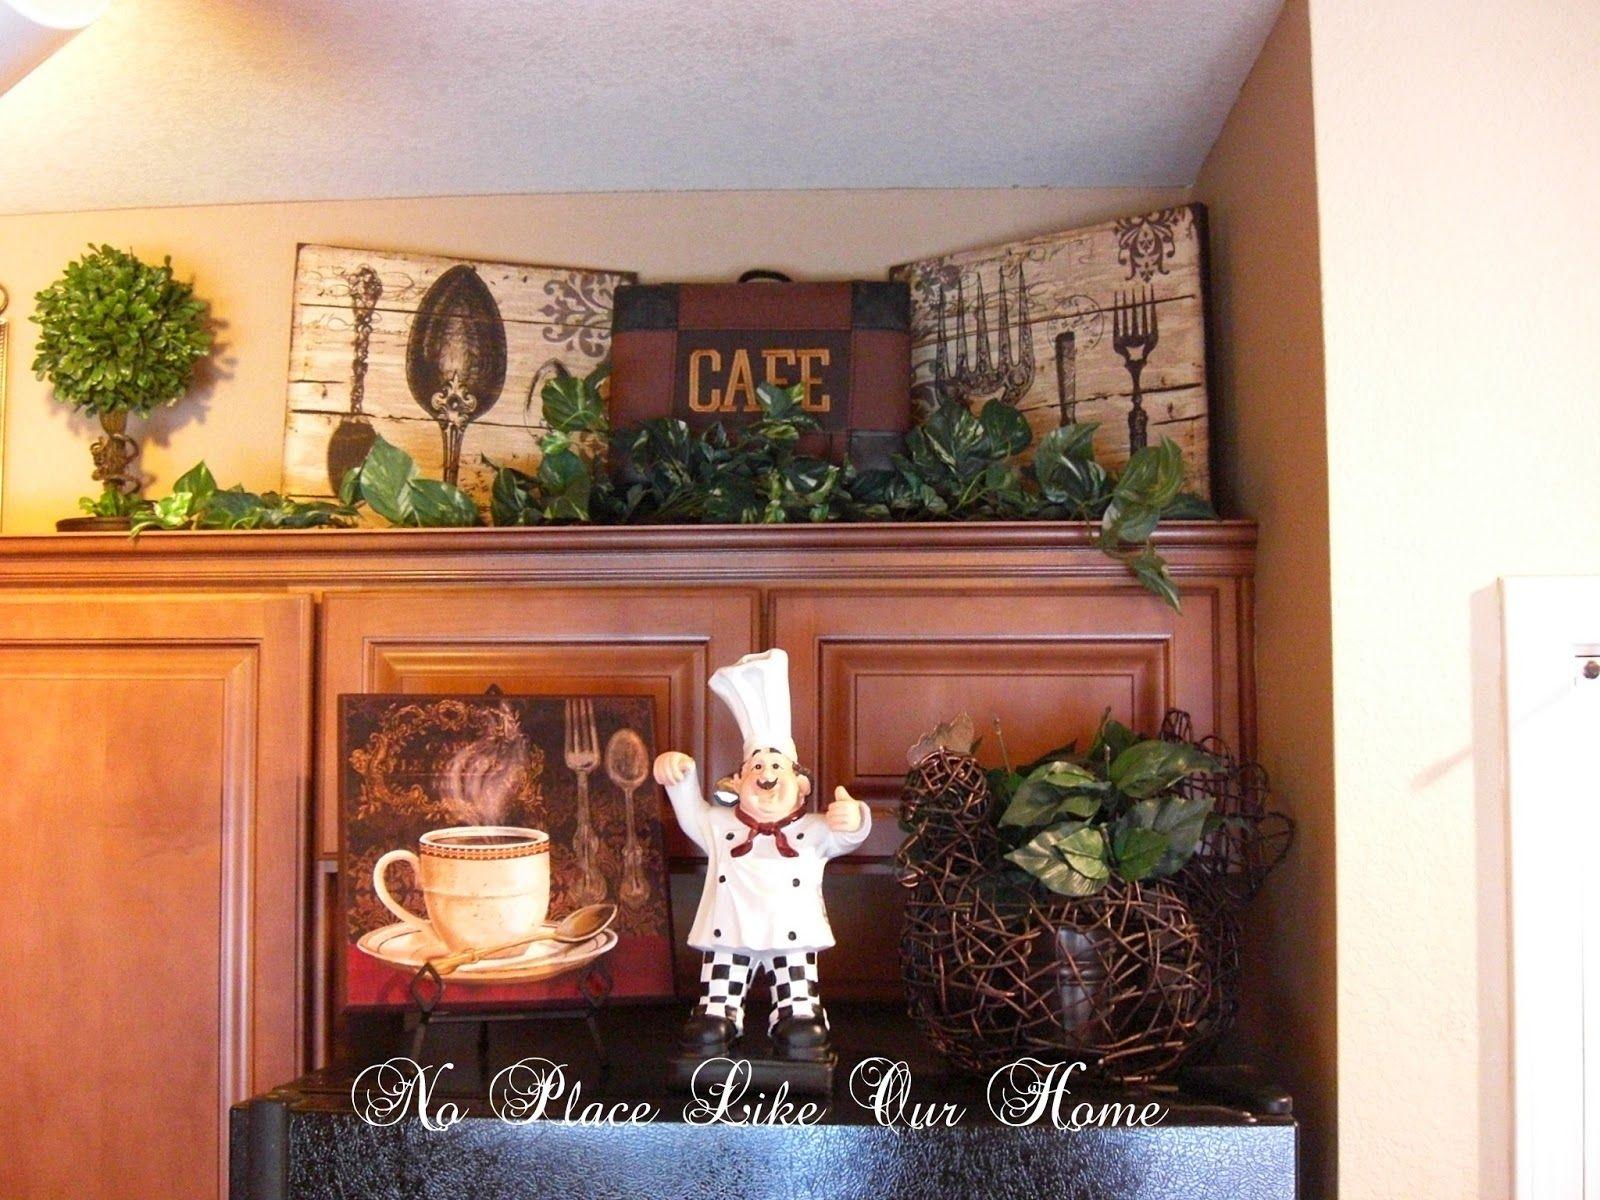 K3 Jpg 1 600 1 200 Pixels Tuscan Decorating Kitchen Decorating Above Kitchen Cabinets Kitchen Vignettes